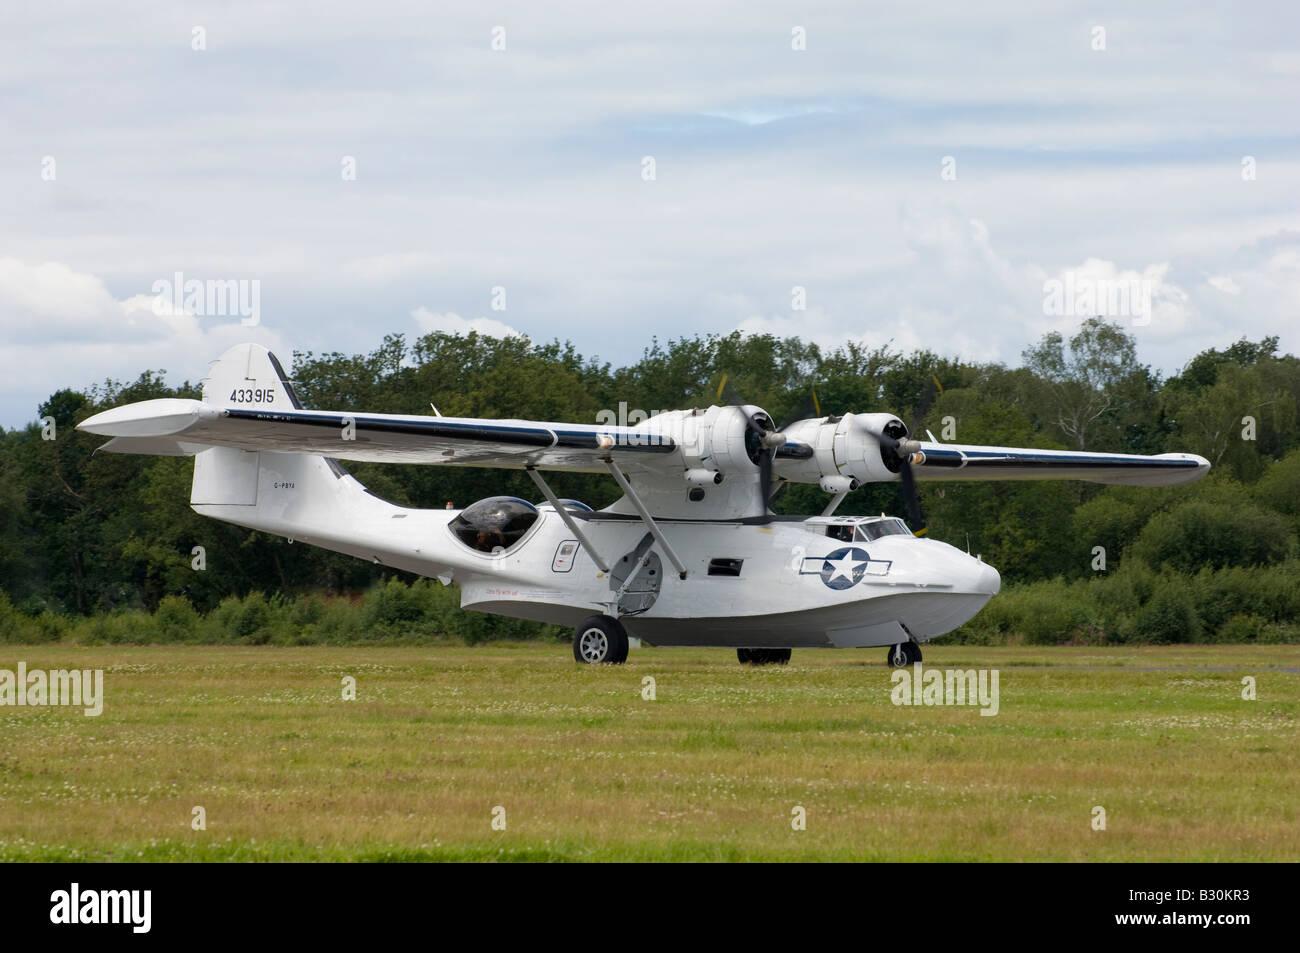 A PBY Catalina seaplane - Stock Image